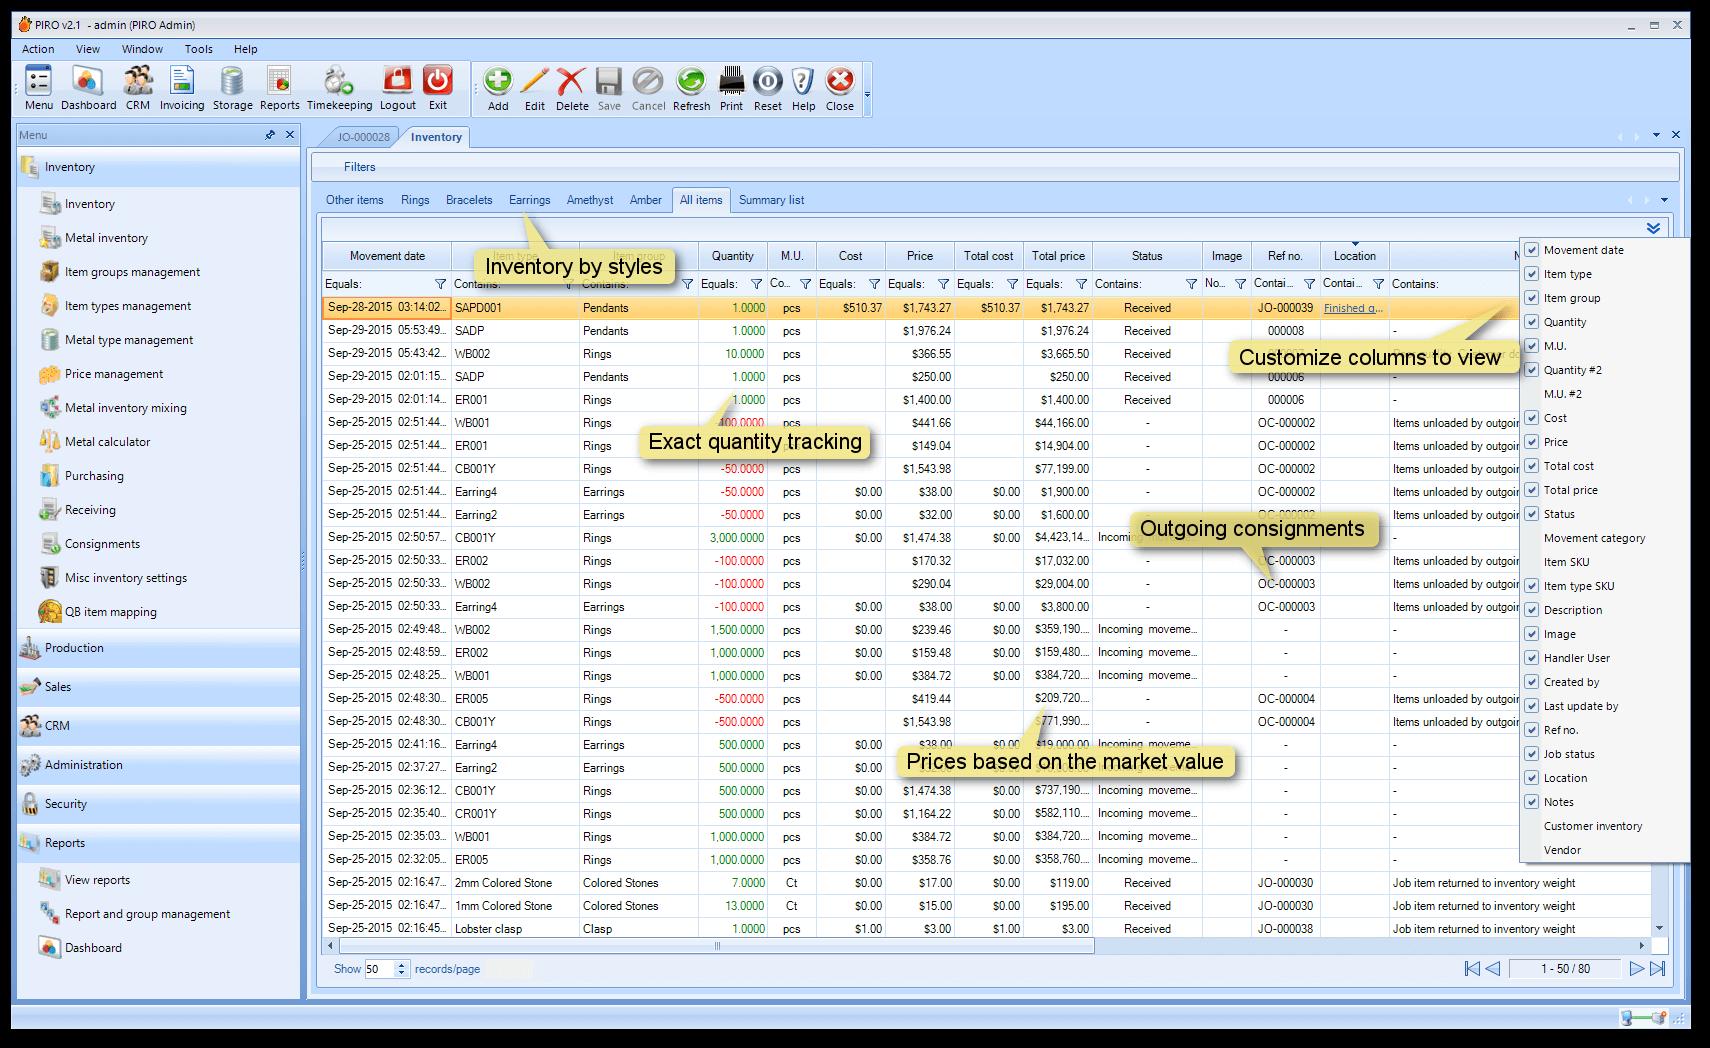 Inventory management | PIRO jewelry software